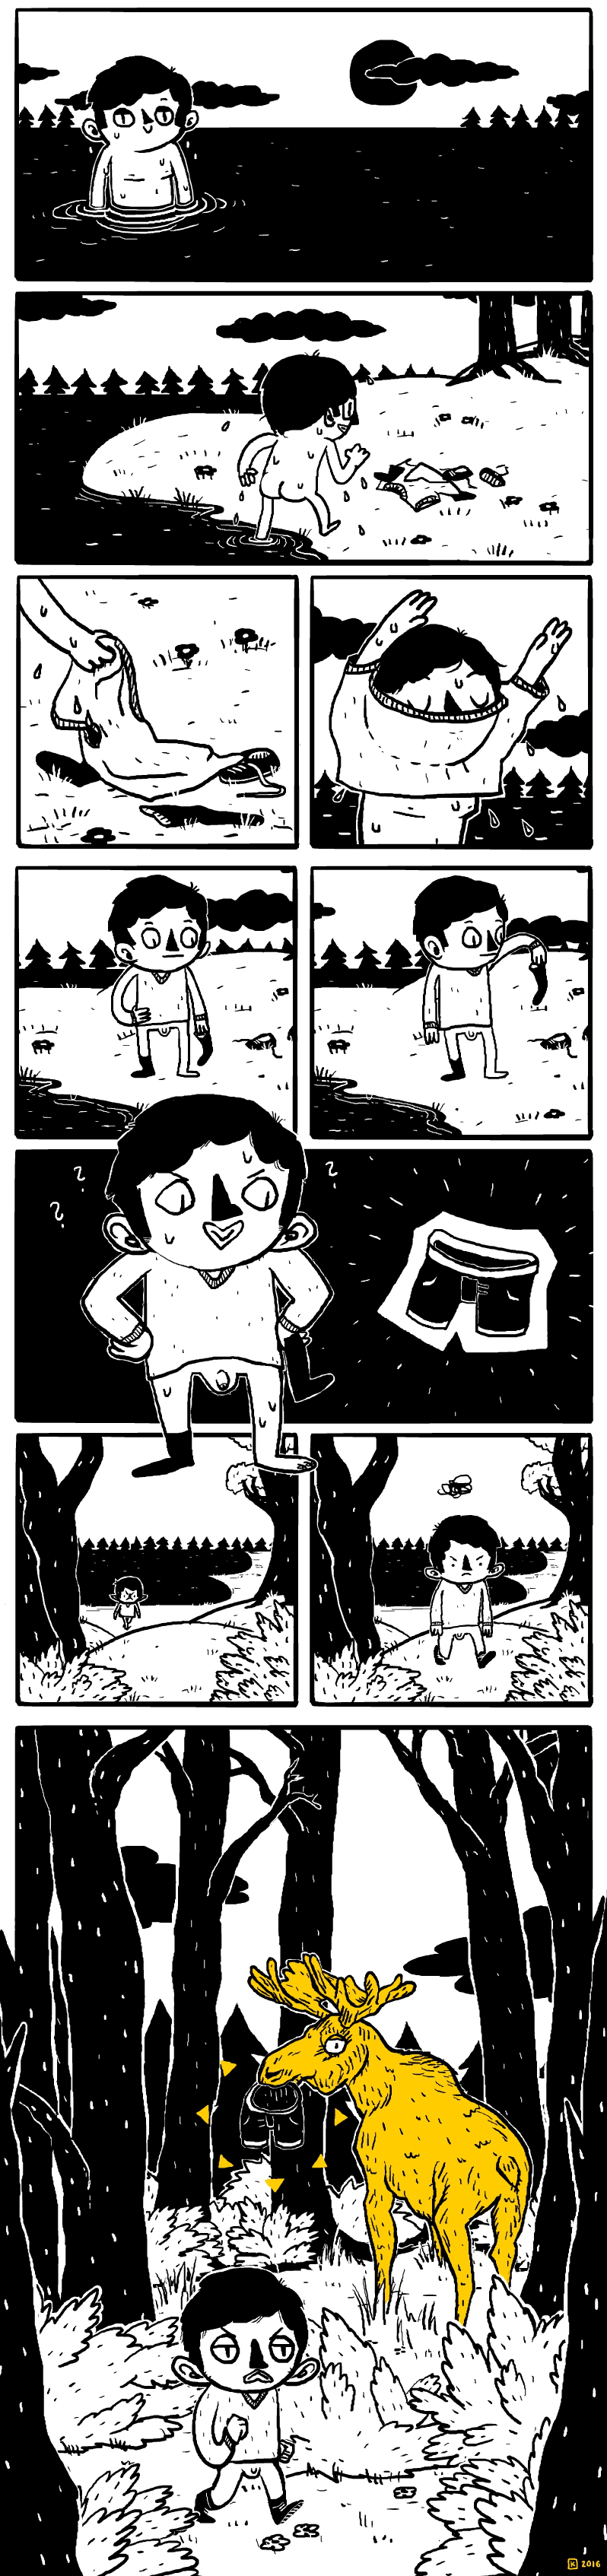 Down by the lake (Comic)